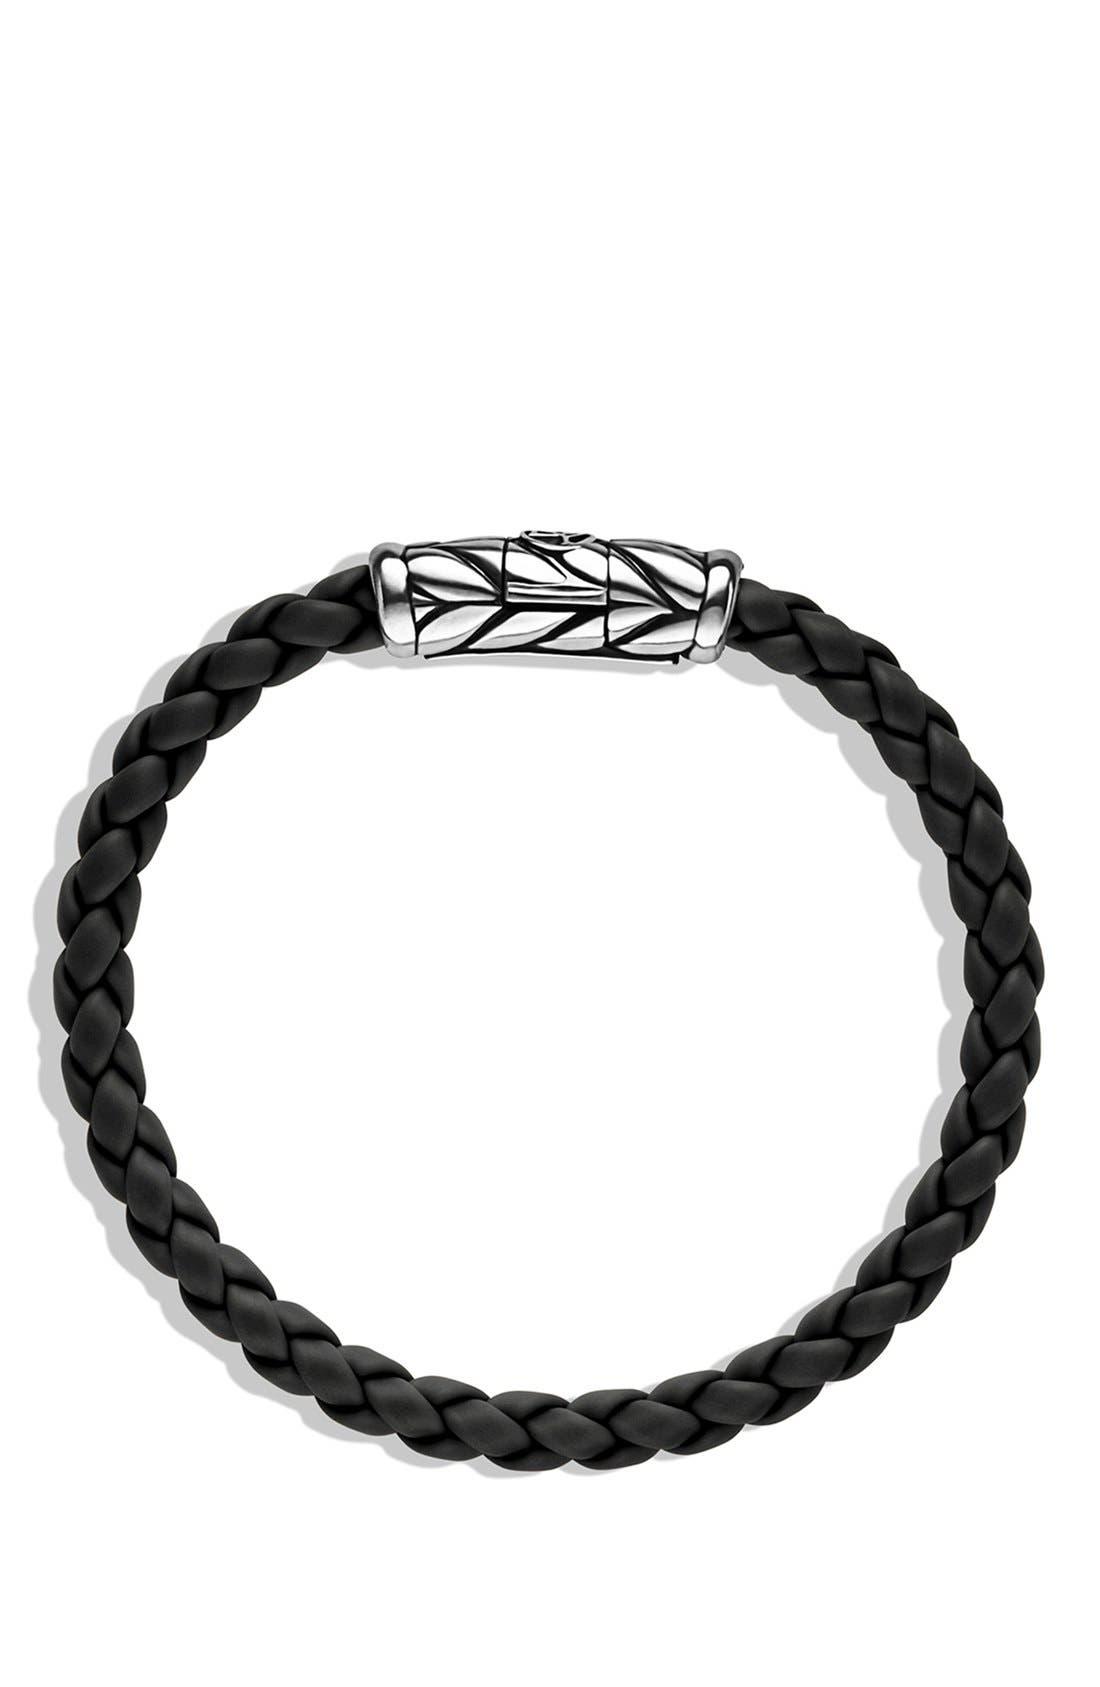 DAVID YURMAN, 'Chevron' Woven Rubber Bracelet, Alternate thumbnail 2, color, BLACK